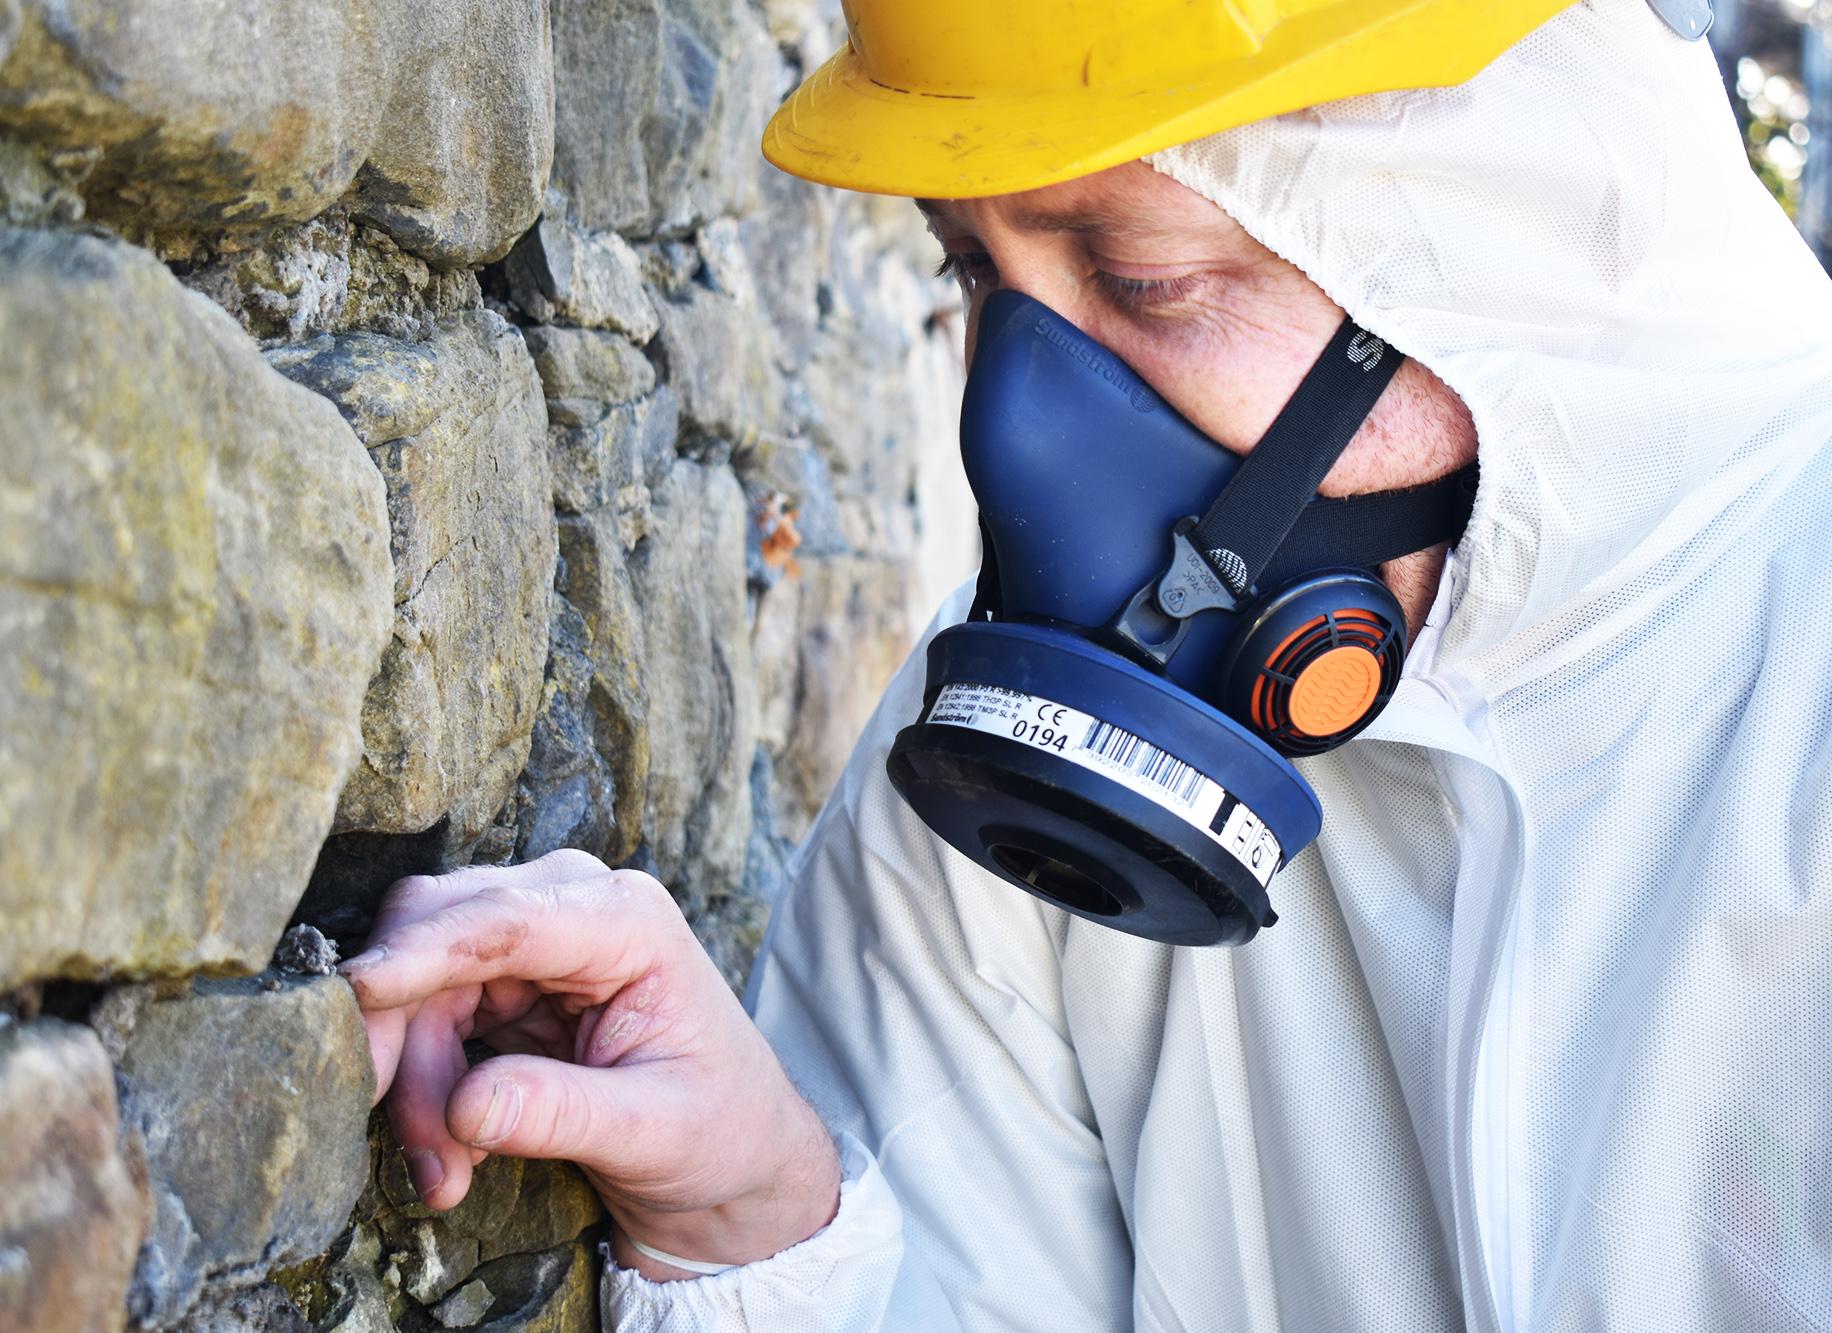 Asbestos Sampling - Asbestos Sampling